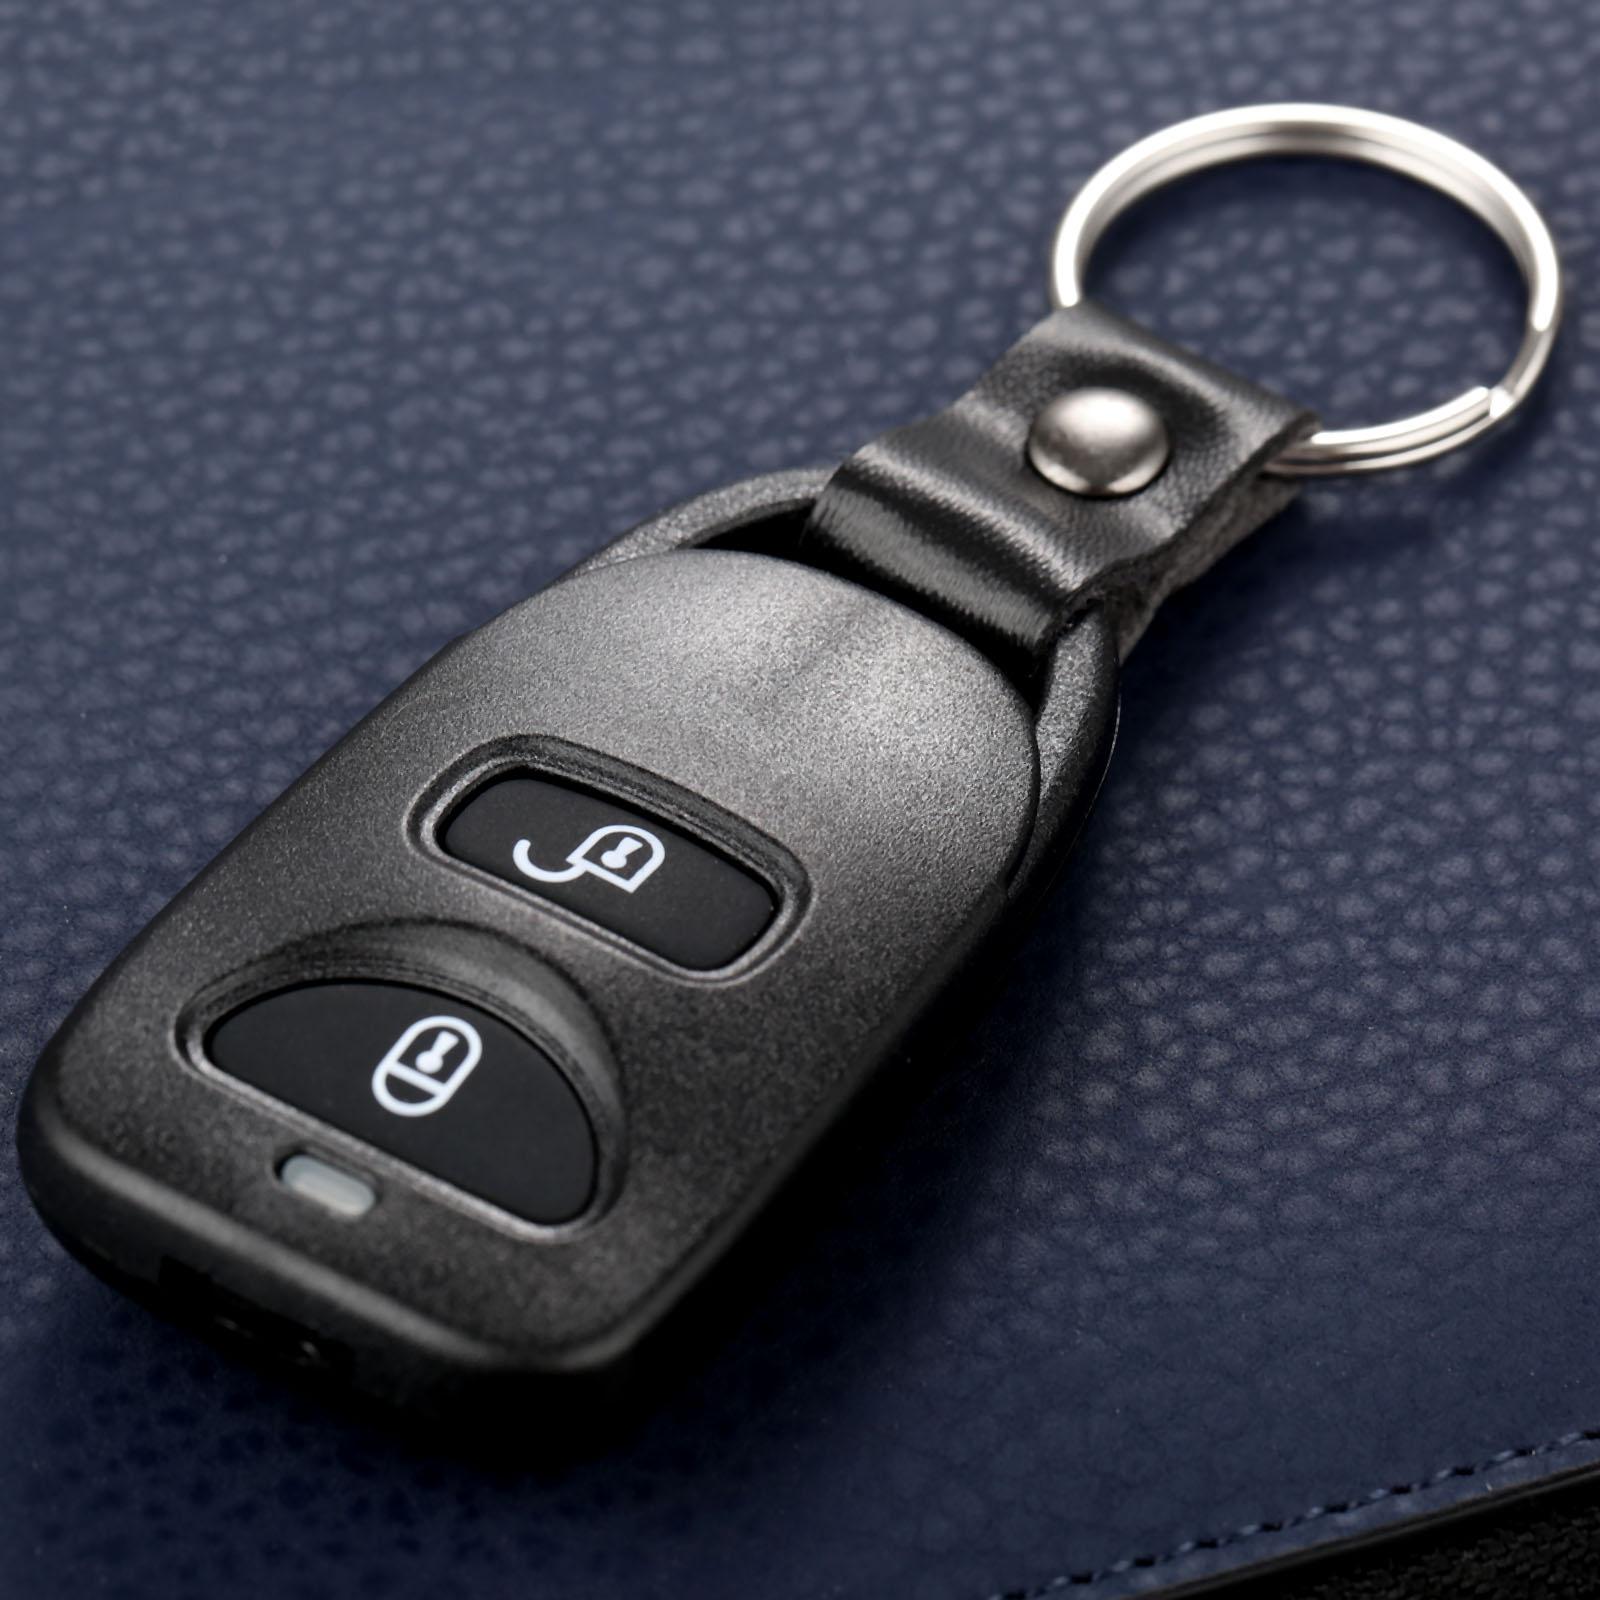 3 Buttons Smart keyless Remote car Key fob 315MHz for Hyundai Elantra Tucson Santa Fe replacement key Transmitter